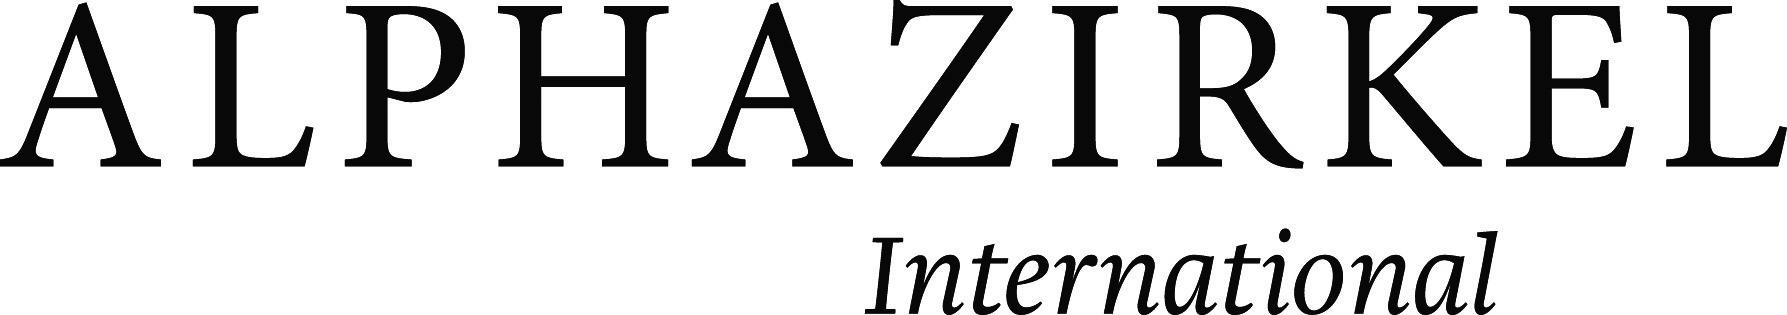 alphazirkel logo